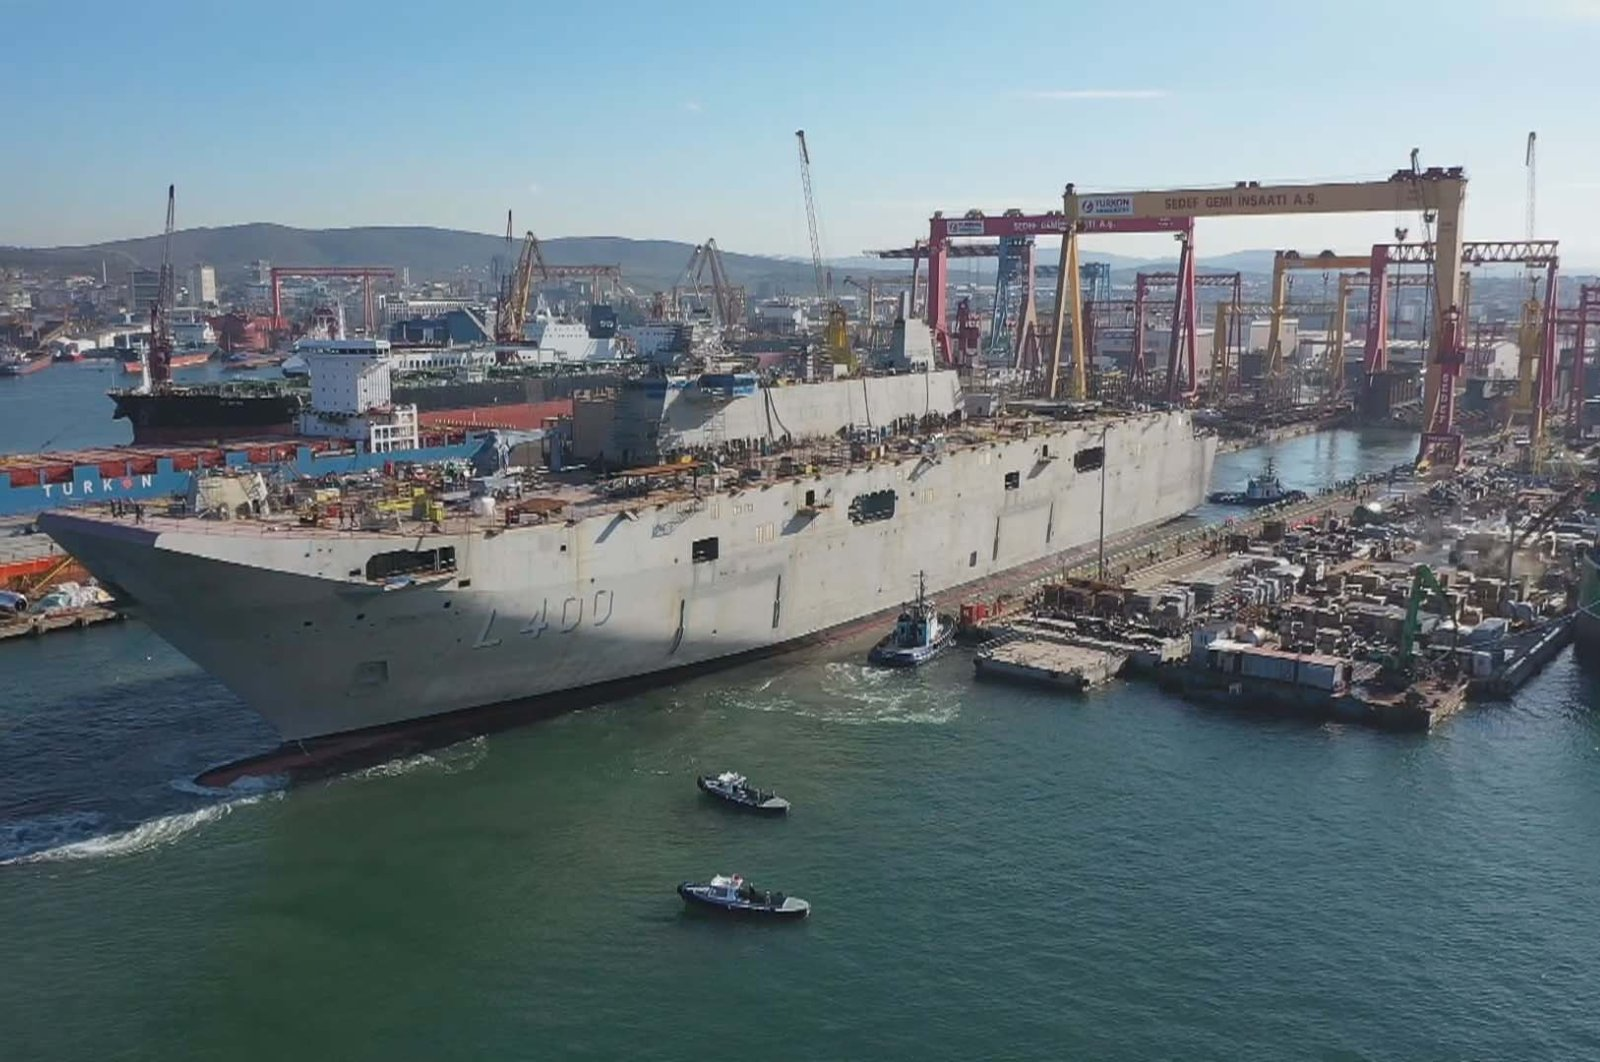 The TCG Anadolu is docked at the Sedef Shipyard in Tuzla, Istanbul, Turkey, Feb. 3, 2020. (DHA Photo)